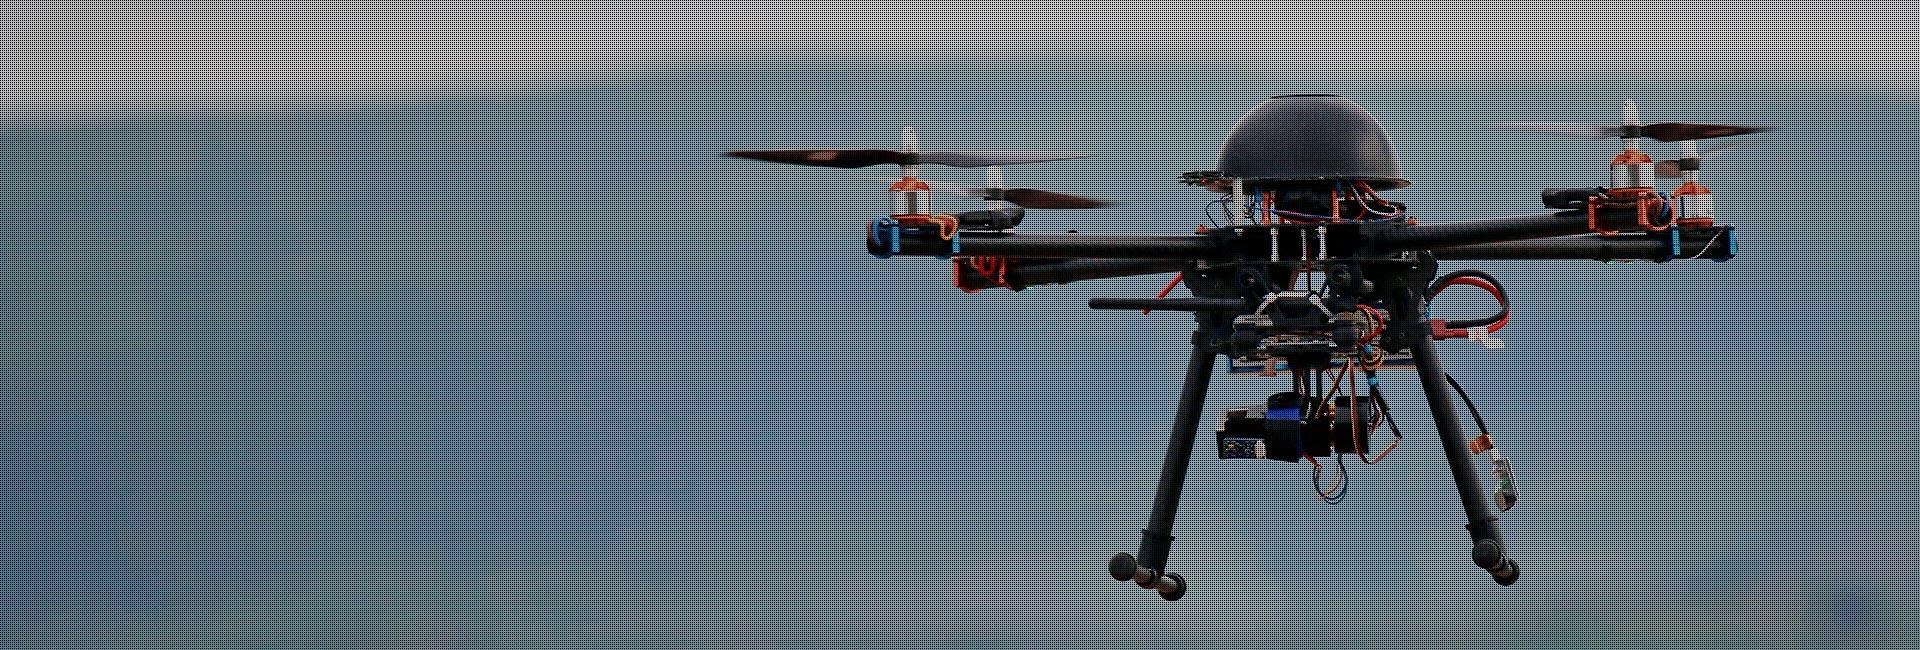 slide-drones-03